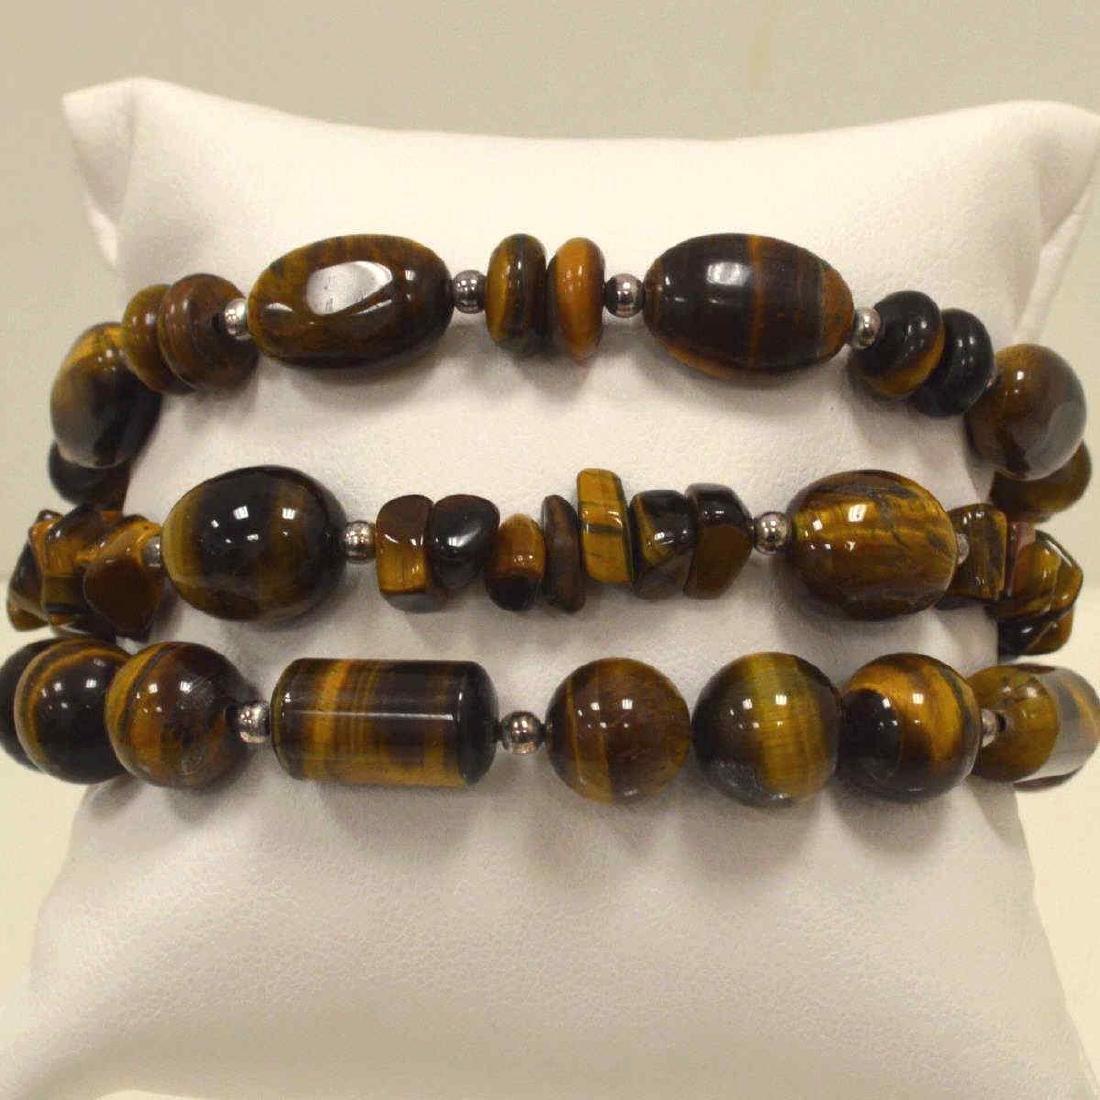 Lot of tiger's eye bead bracelets